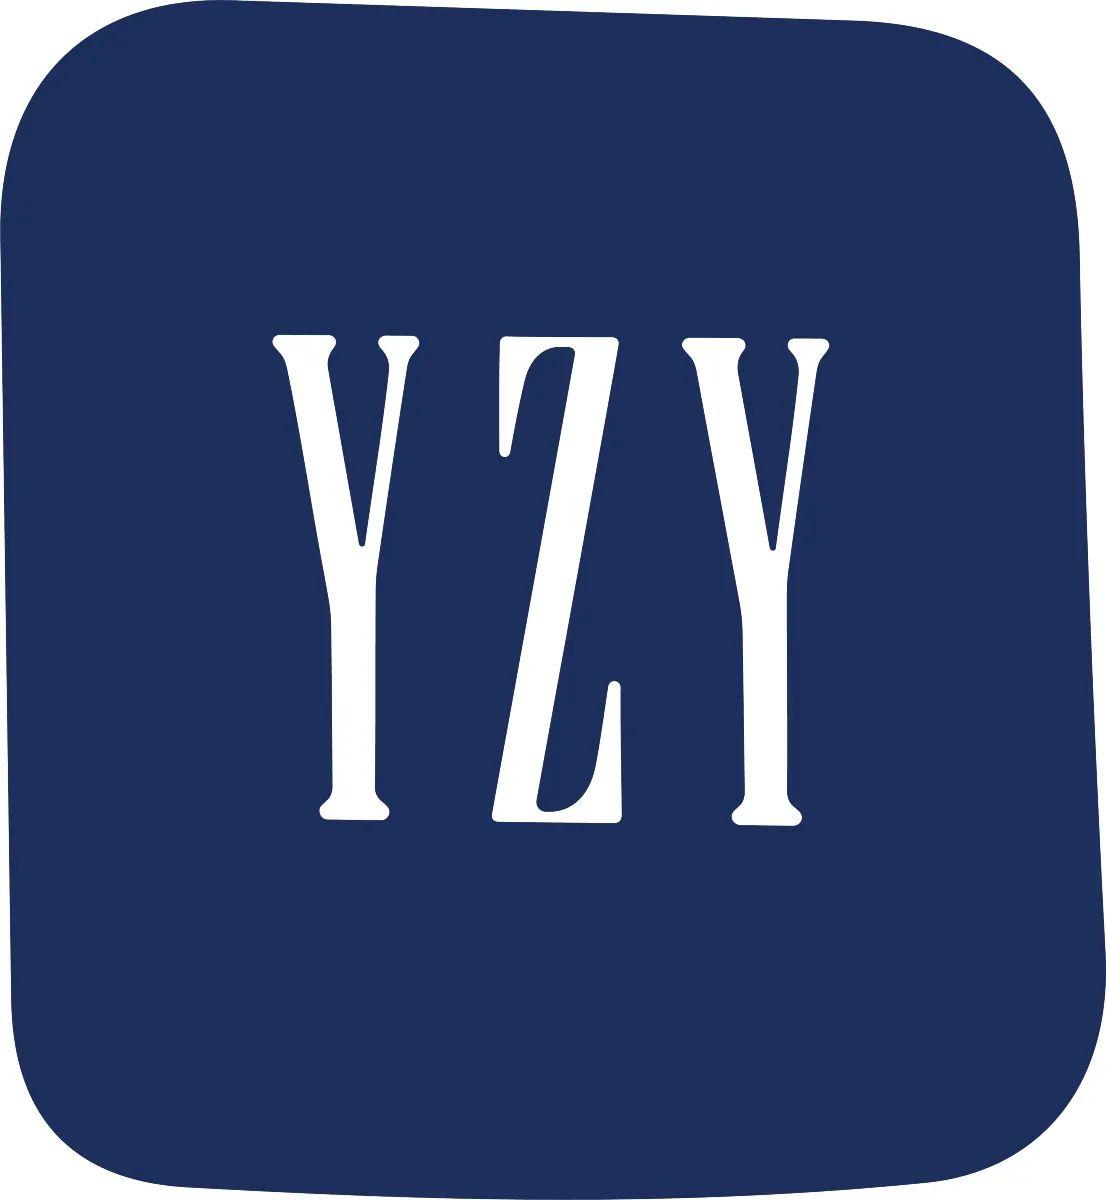 kanye-west-yeezy-gap-launch-2021